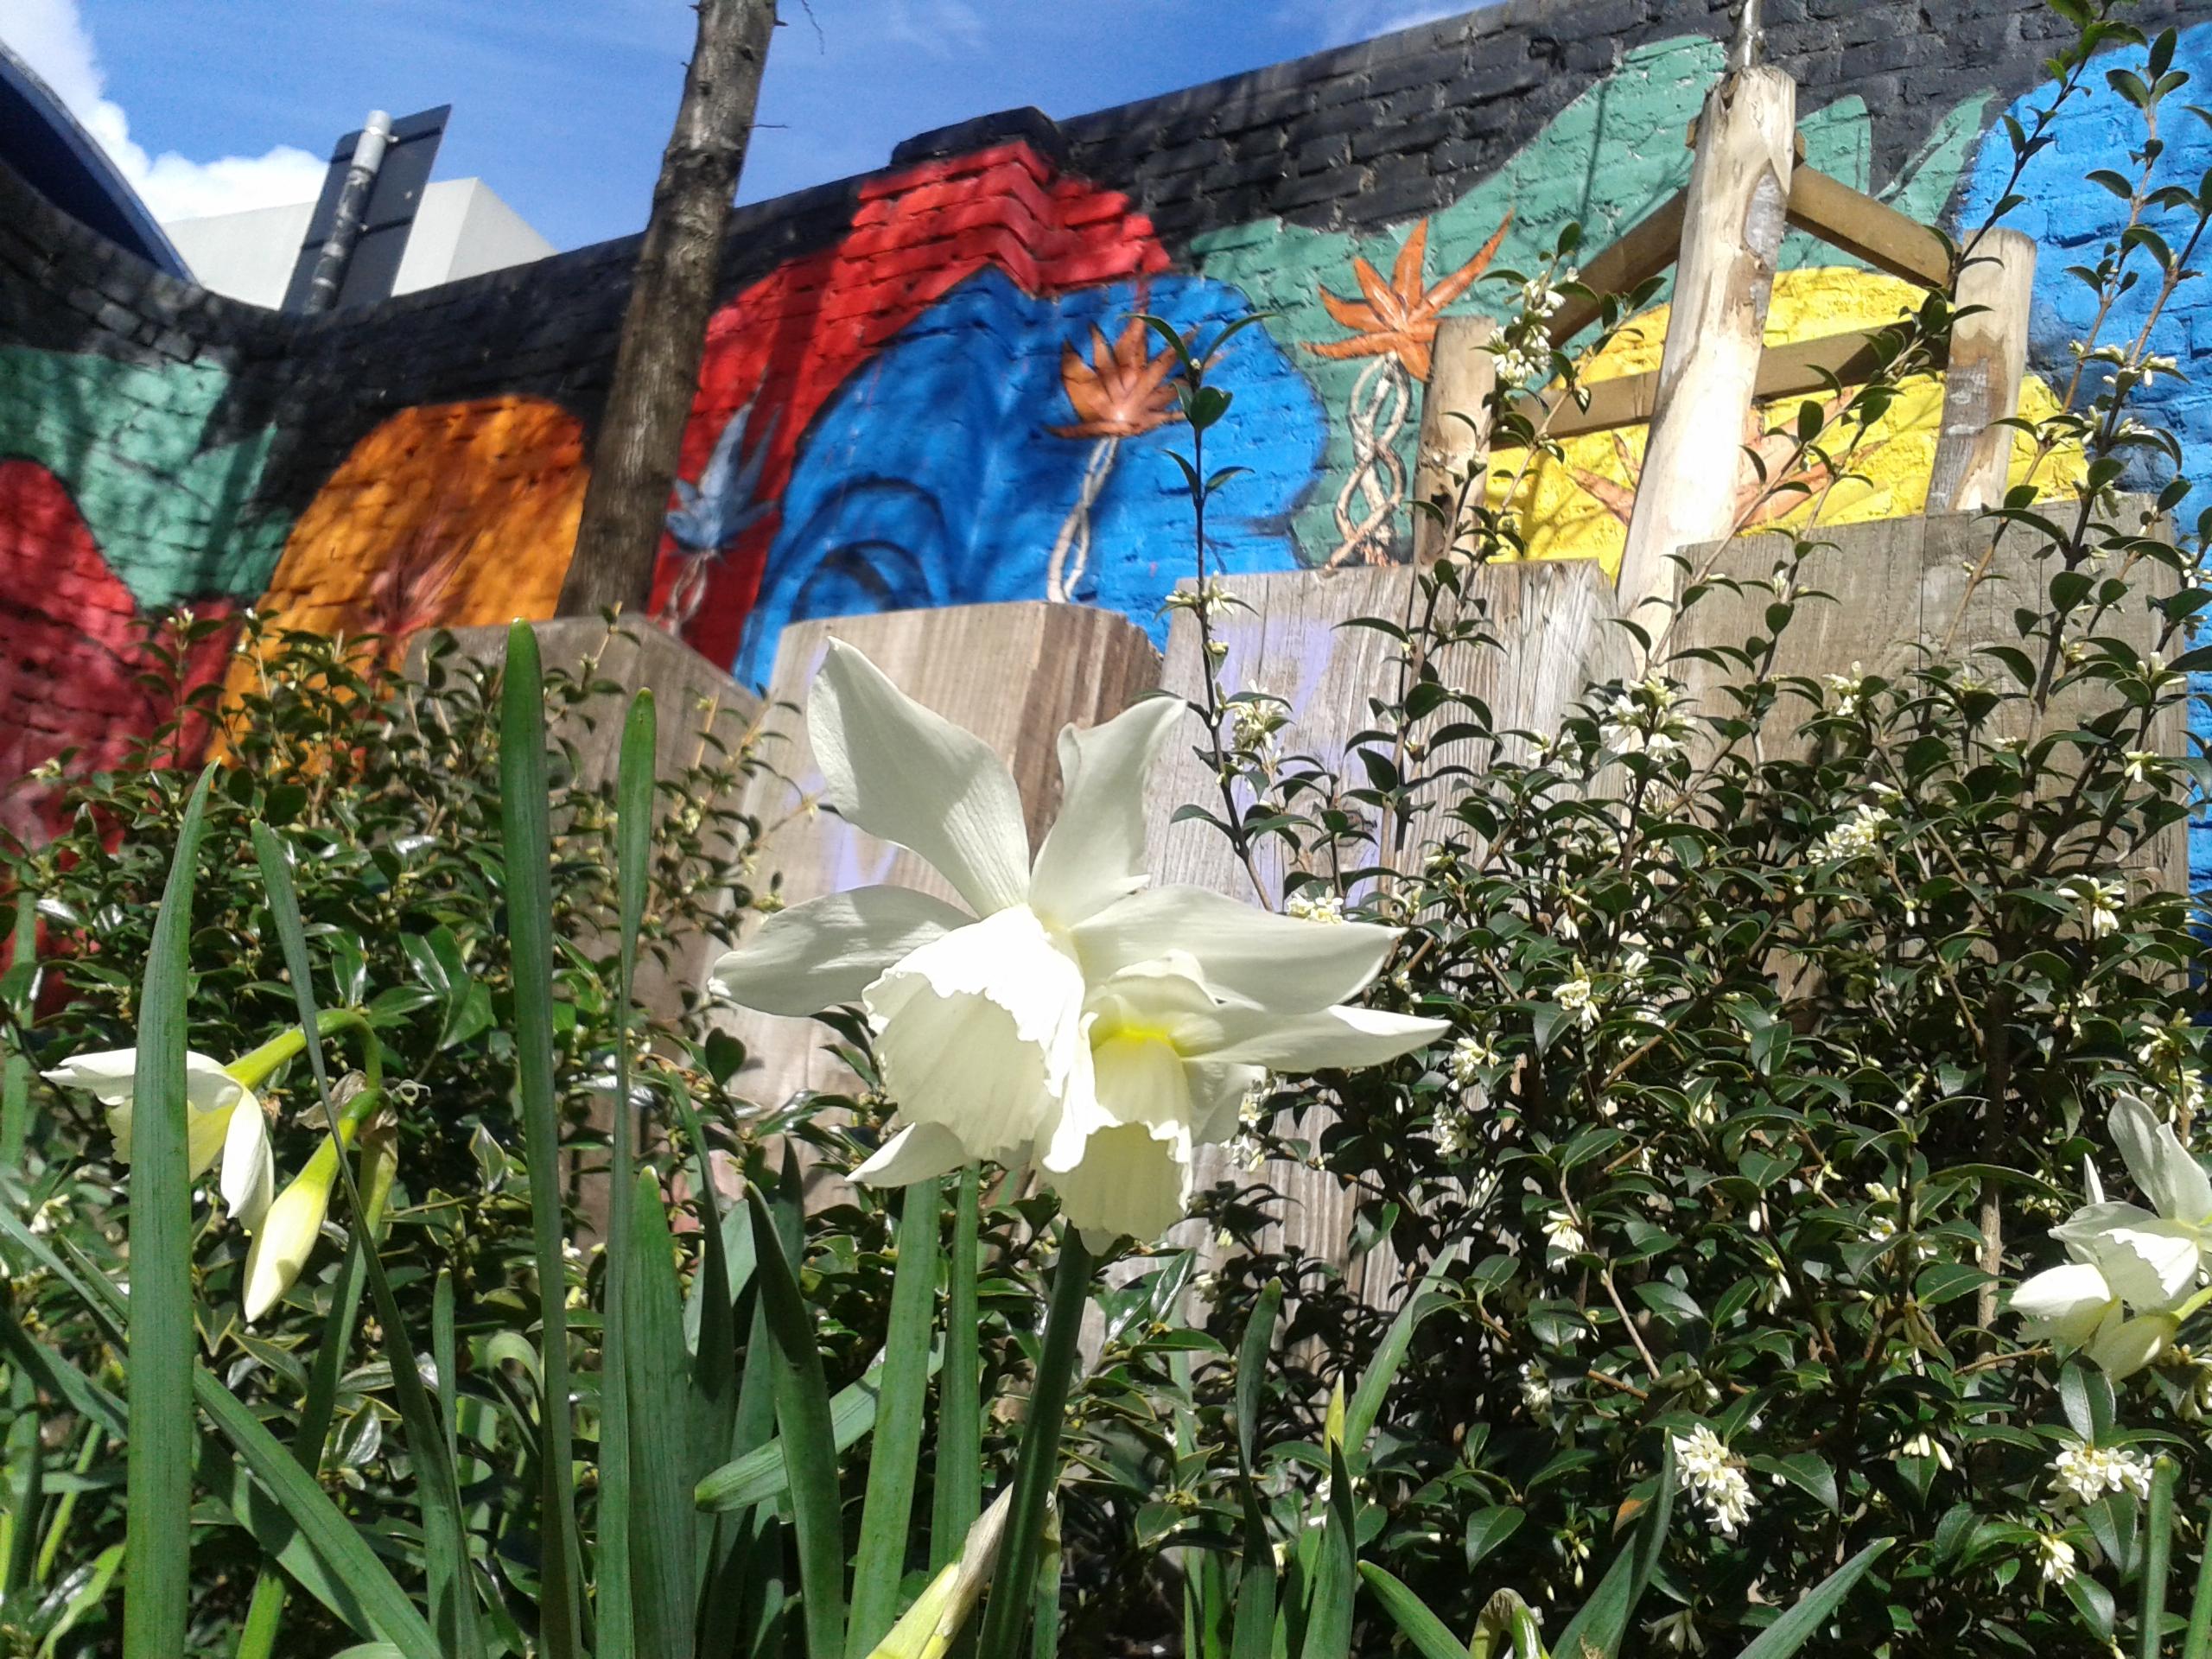 a daffodil in the SkyWay garden